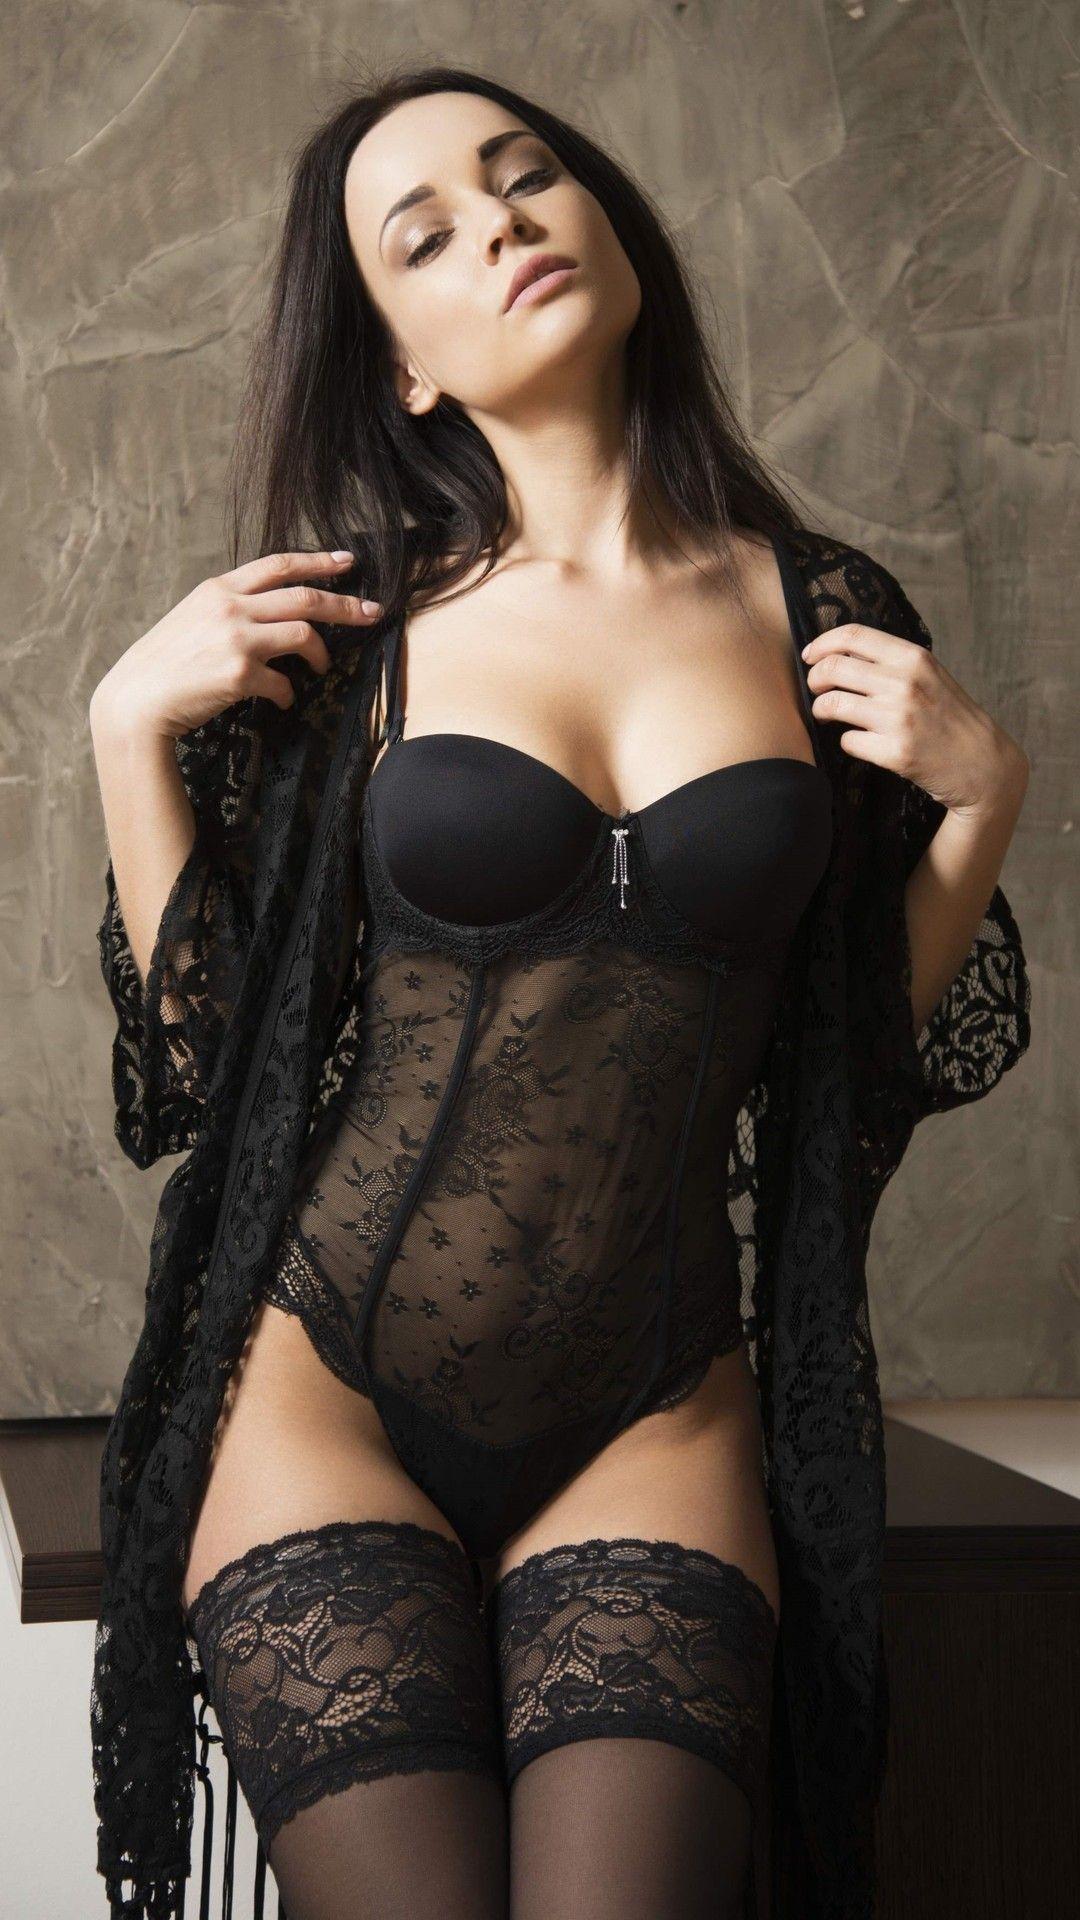 9b8def56f The Erotic Exhibition Hot Brunette